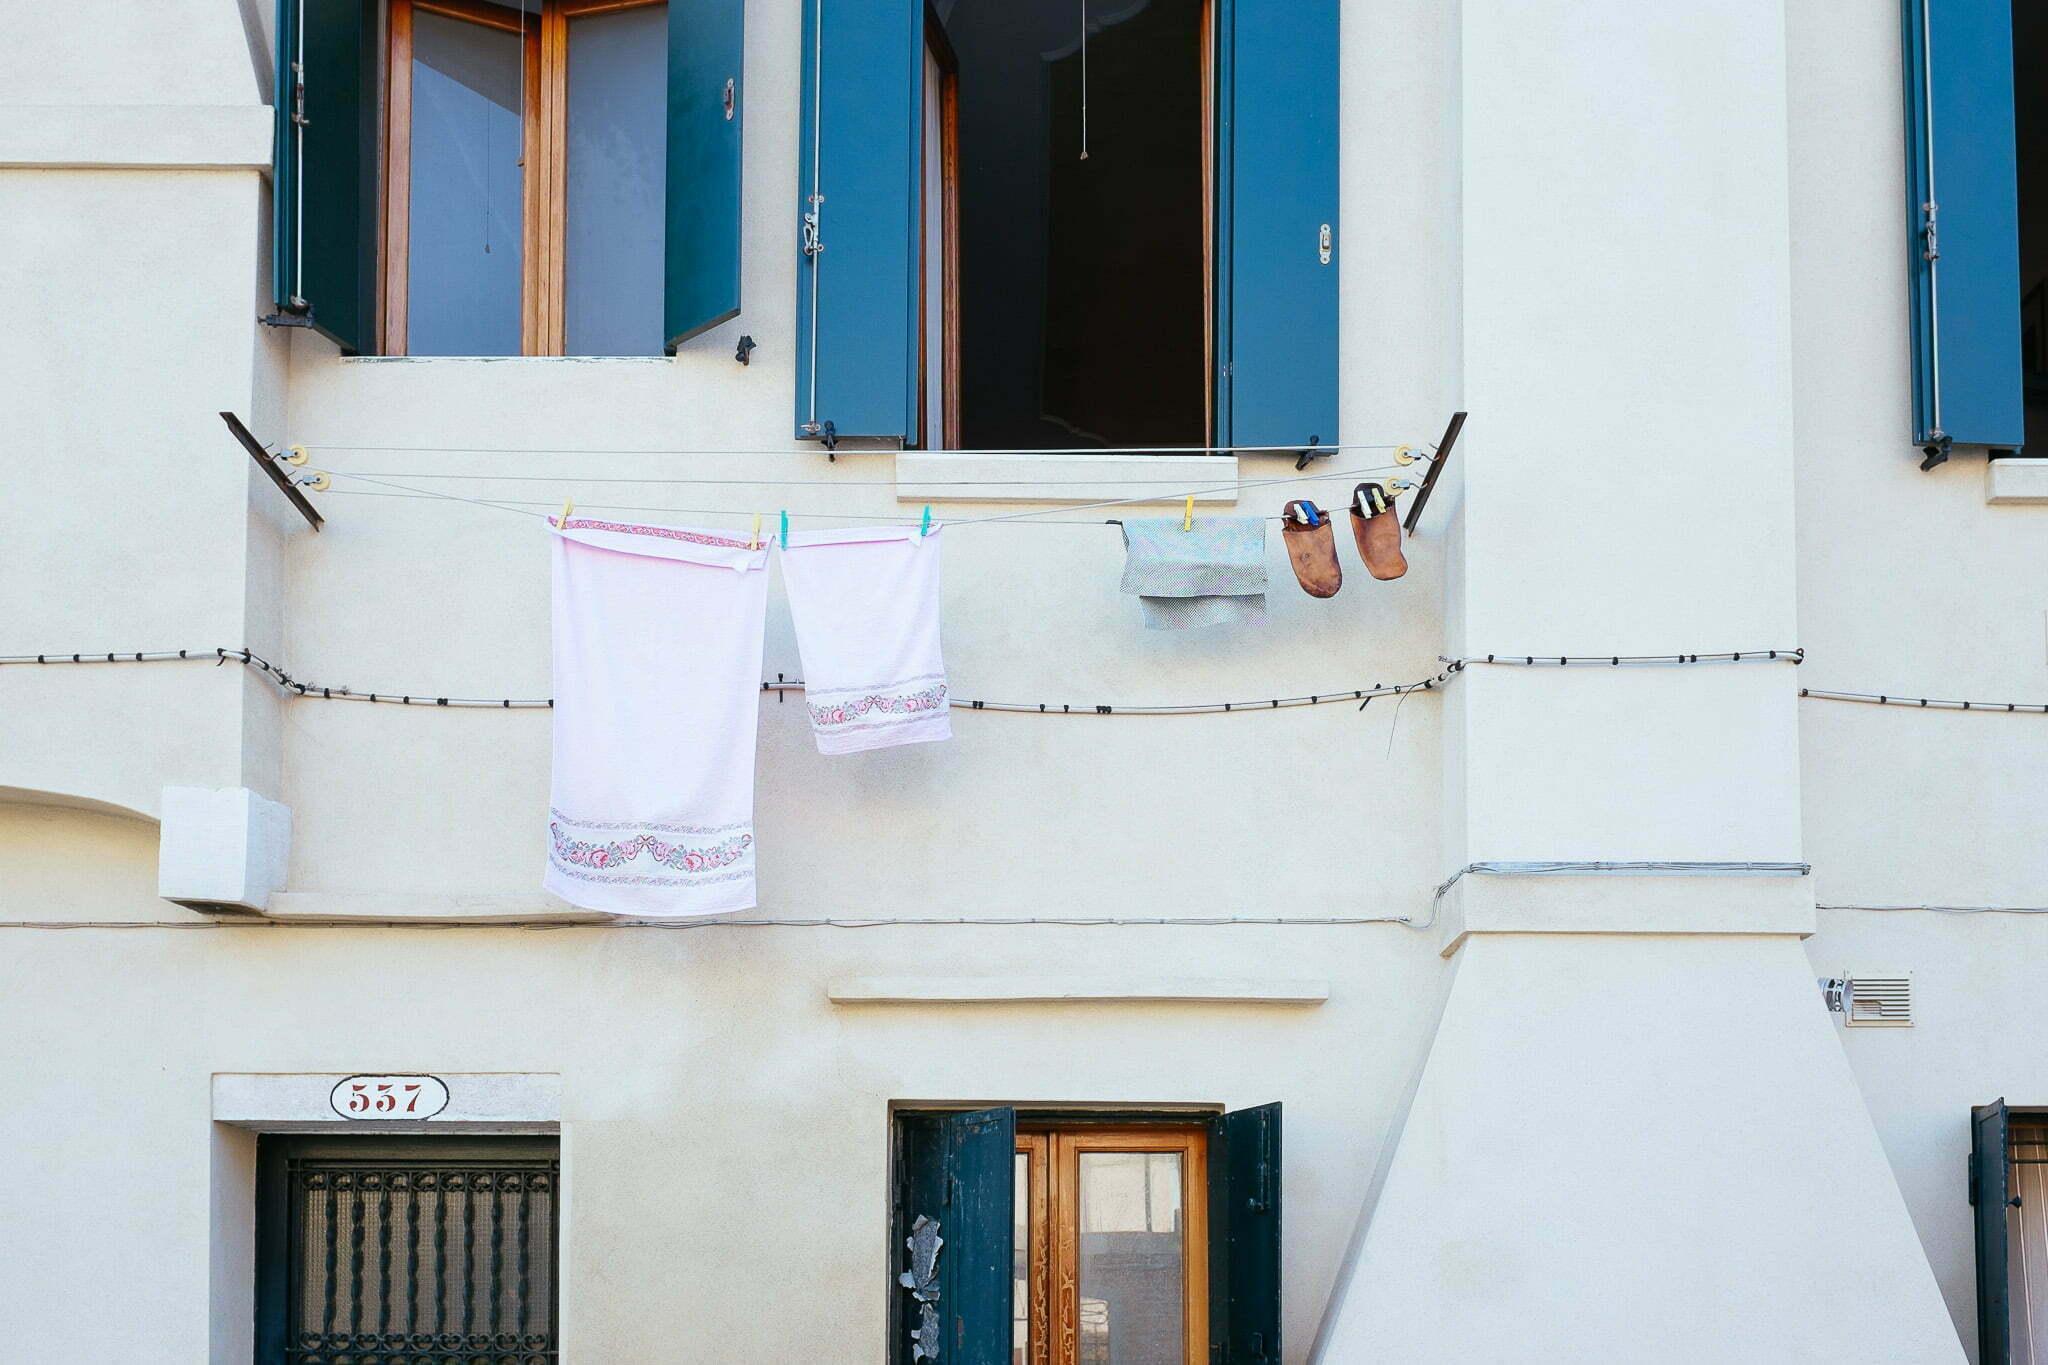 venice-washing-lines-7725